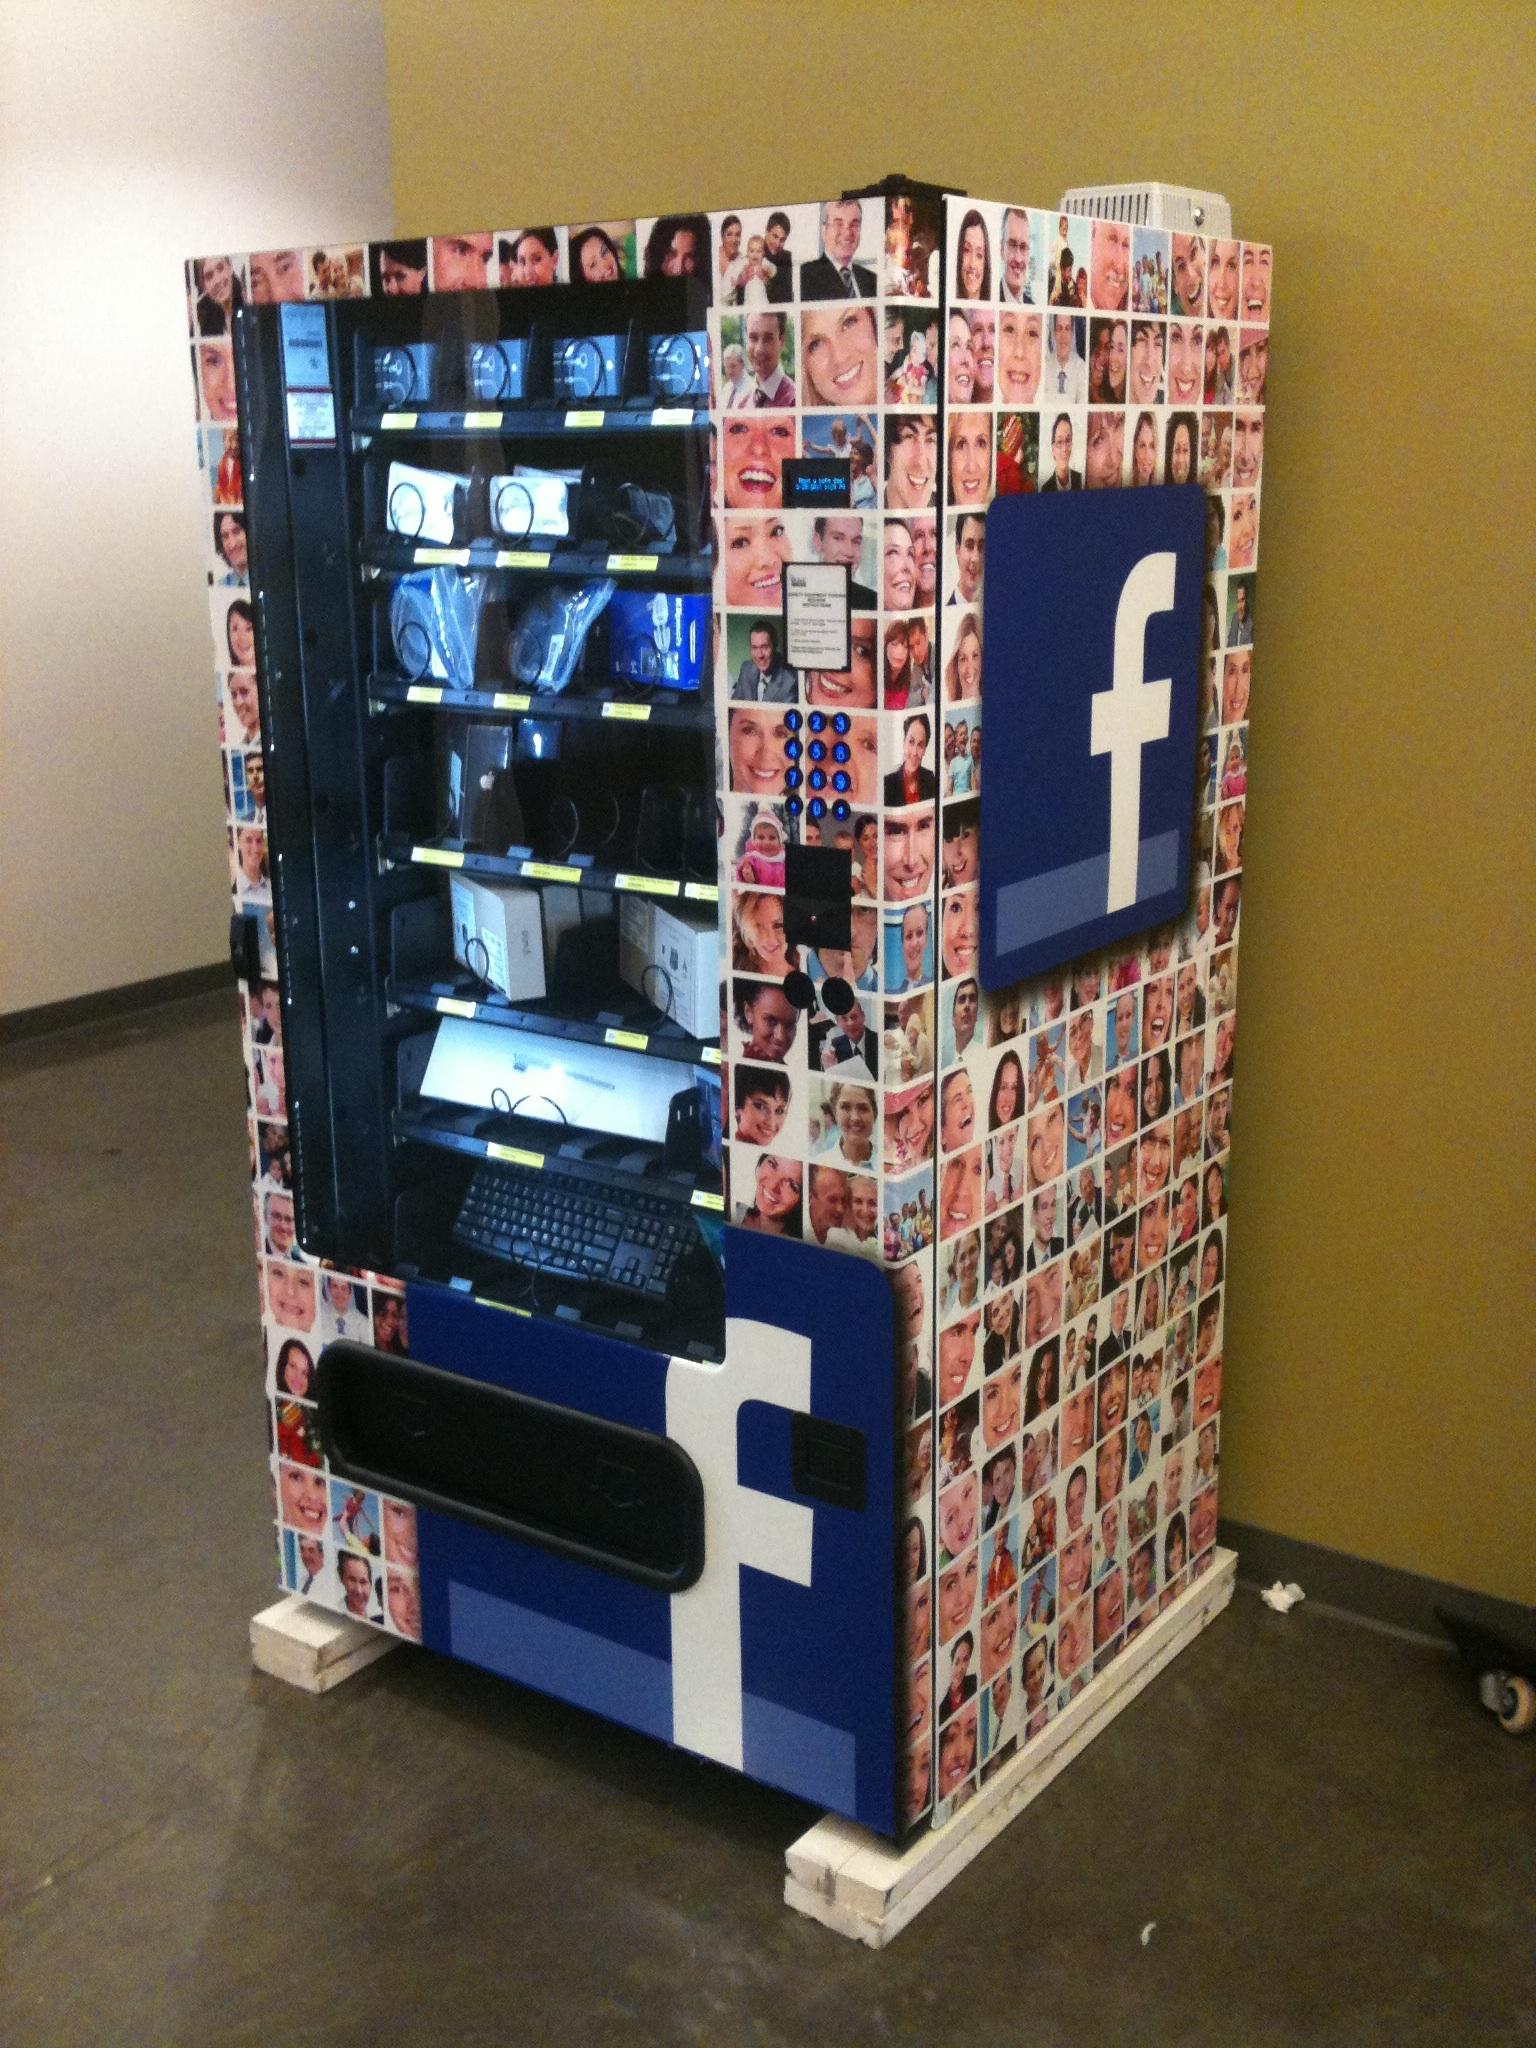 Google Copies Facebook Installs Gadget Vending Machines